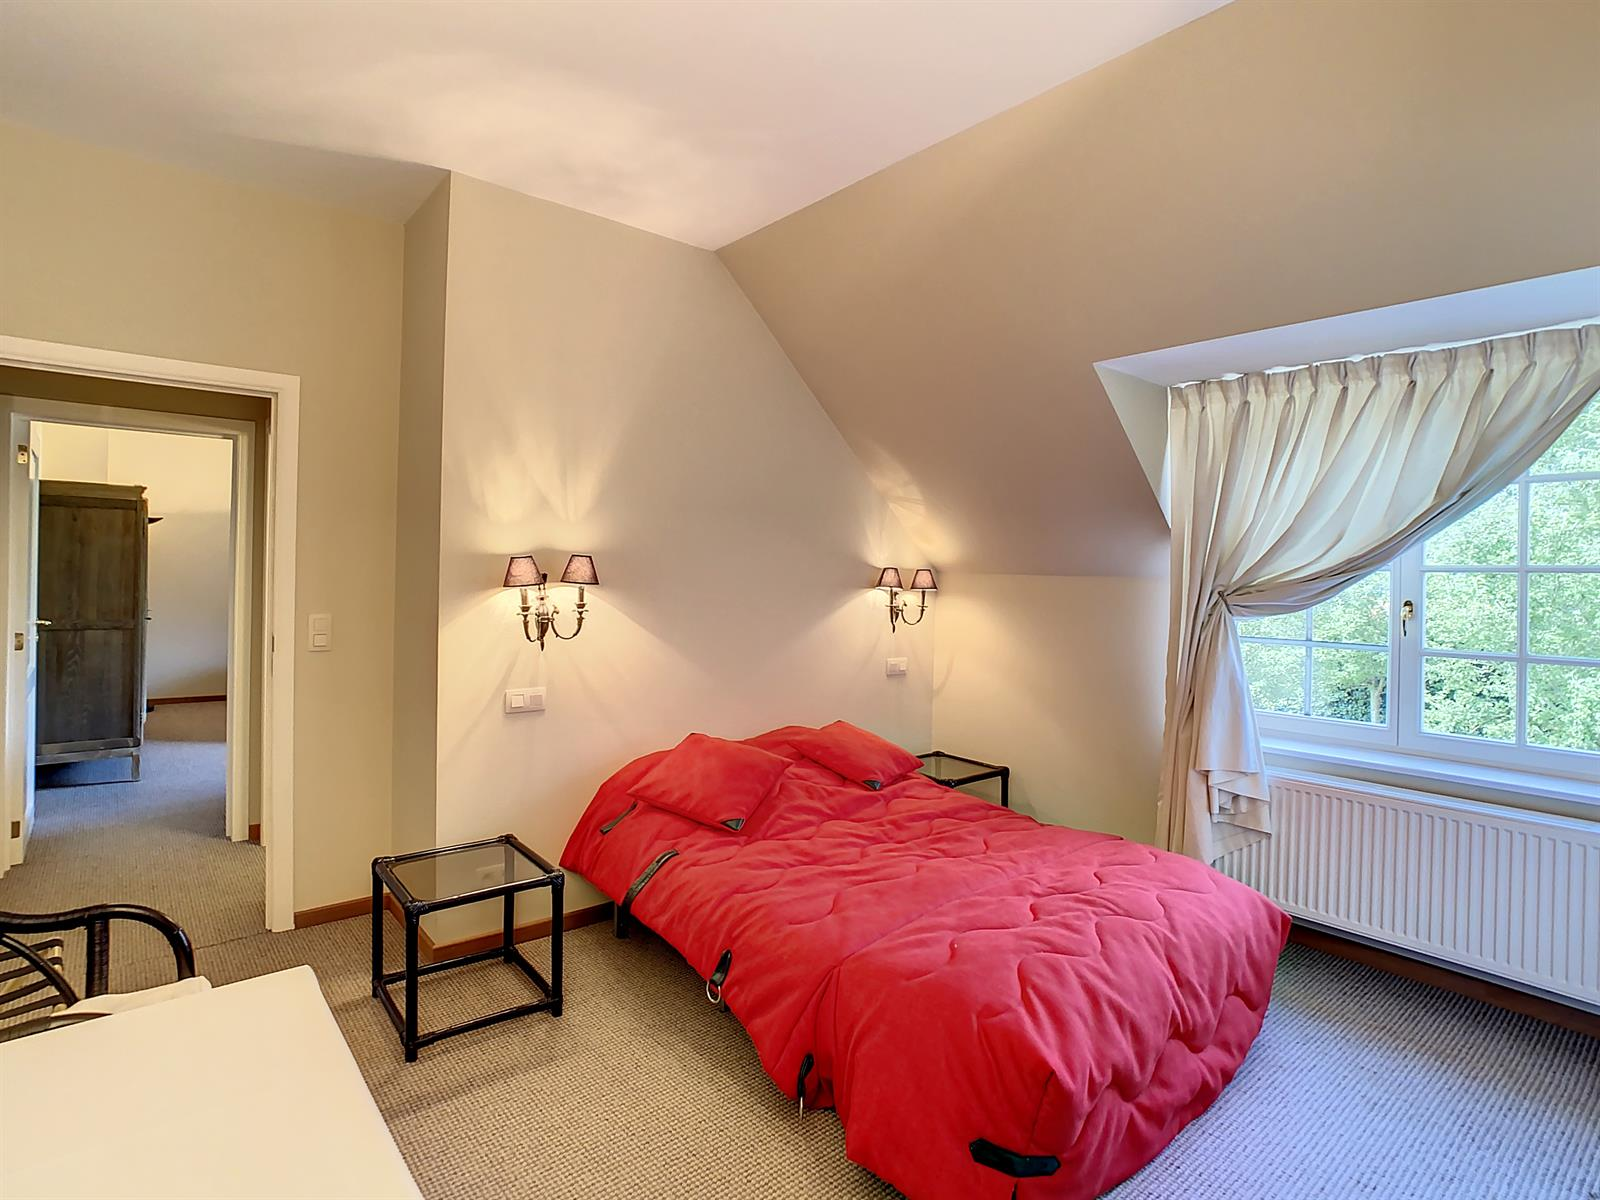 Belle et spacieuse demeure